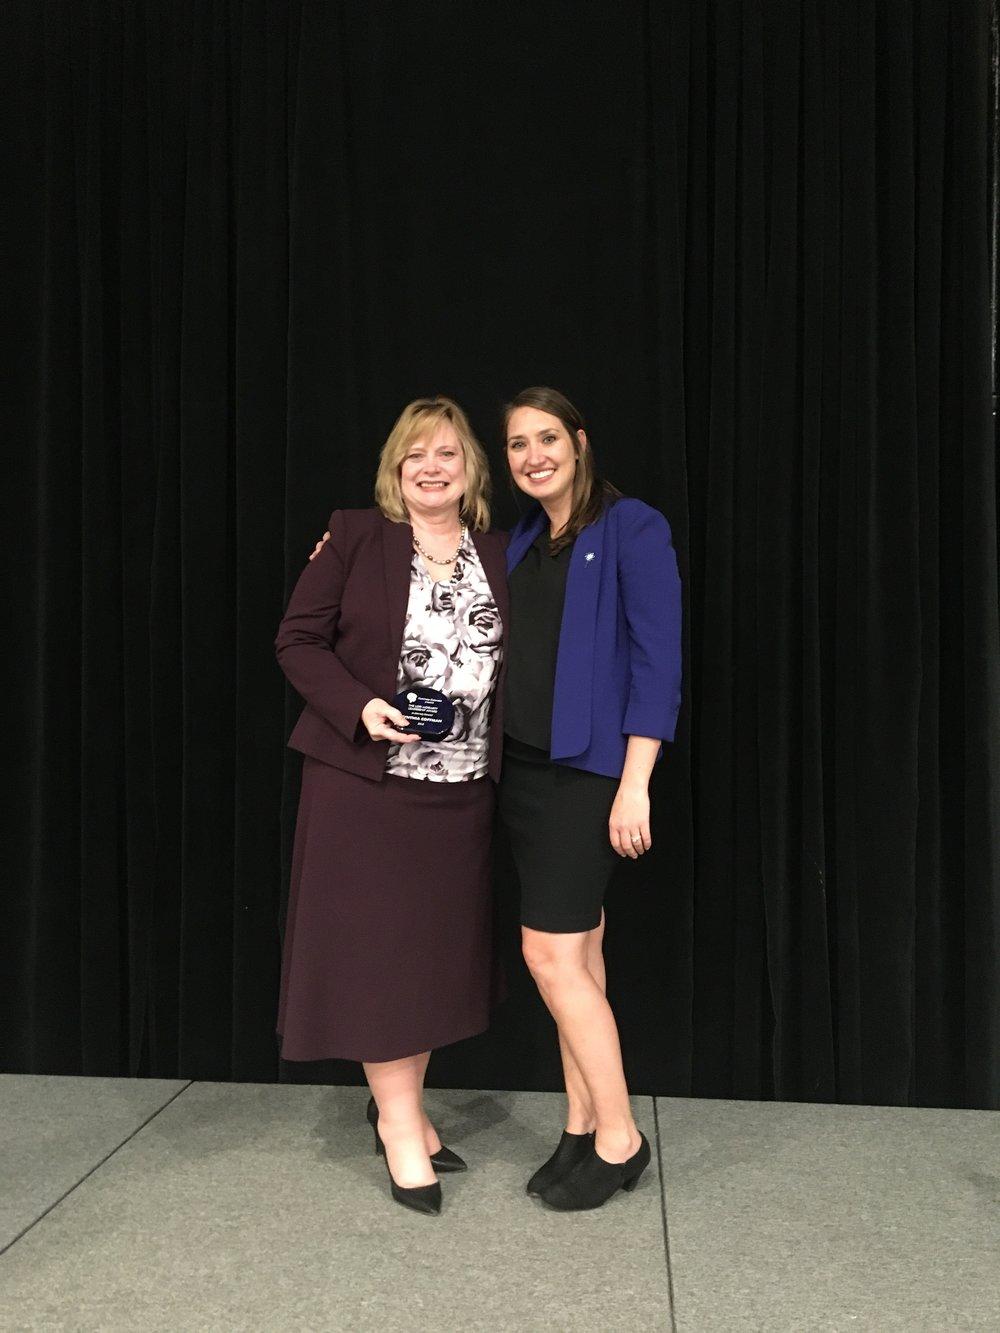 Awardee Attorney general cynthia coffman poses with Illuminate's executive director jade woodard.